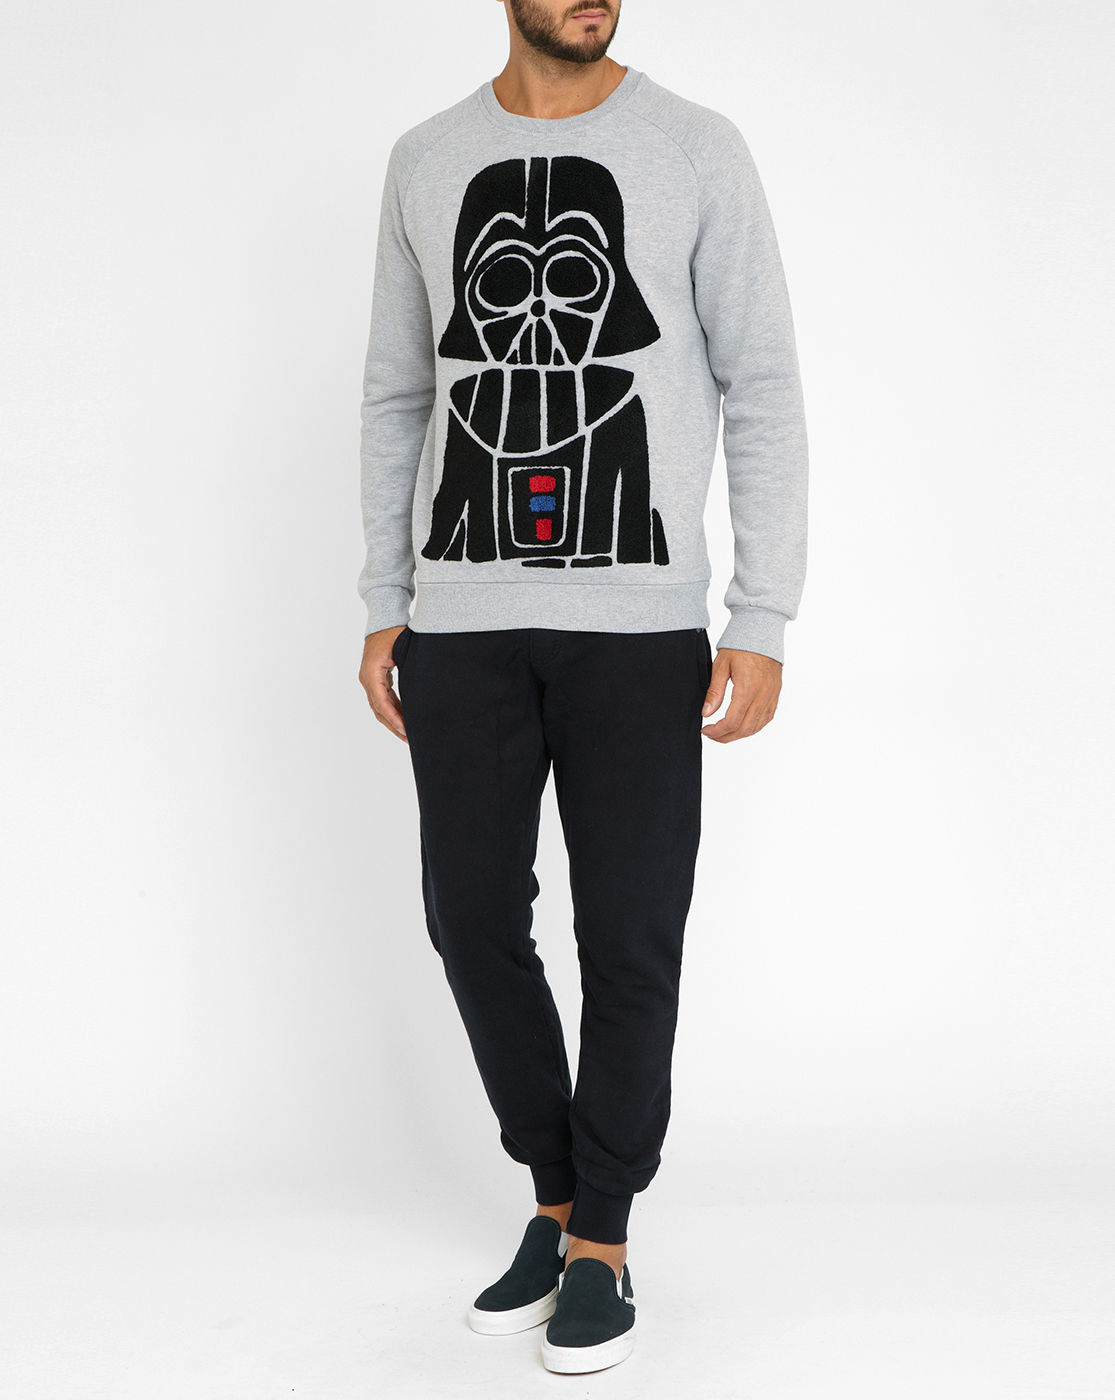 eleven paris mottled grey darth vader terry cloth sweatshirt in gray for men grey lyst. Black Bedroom Furniture Sets. Home Design Ideas